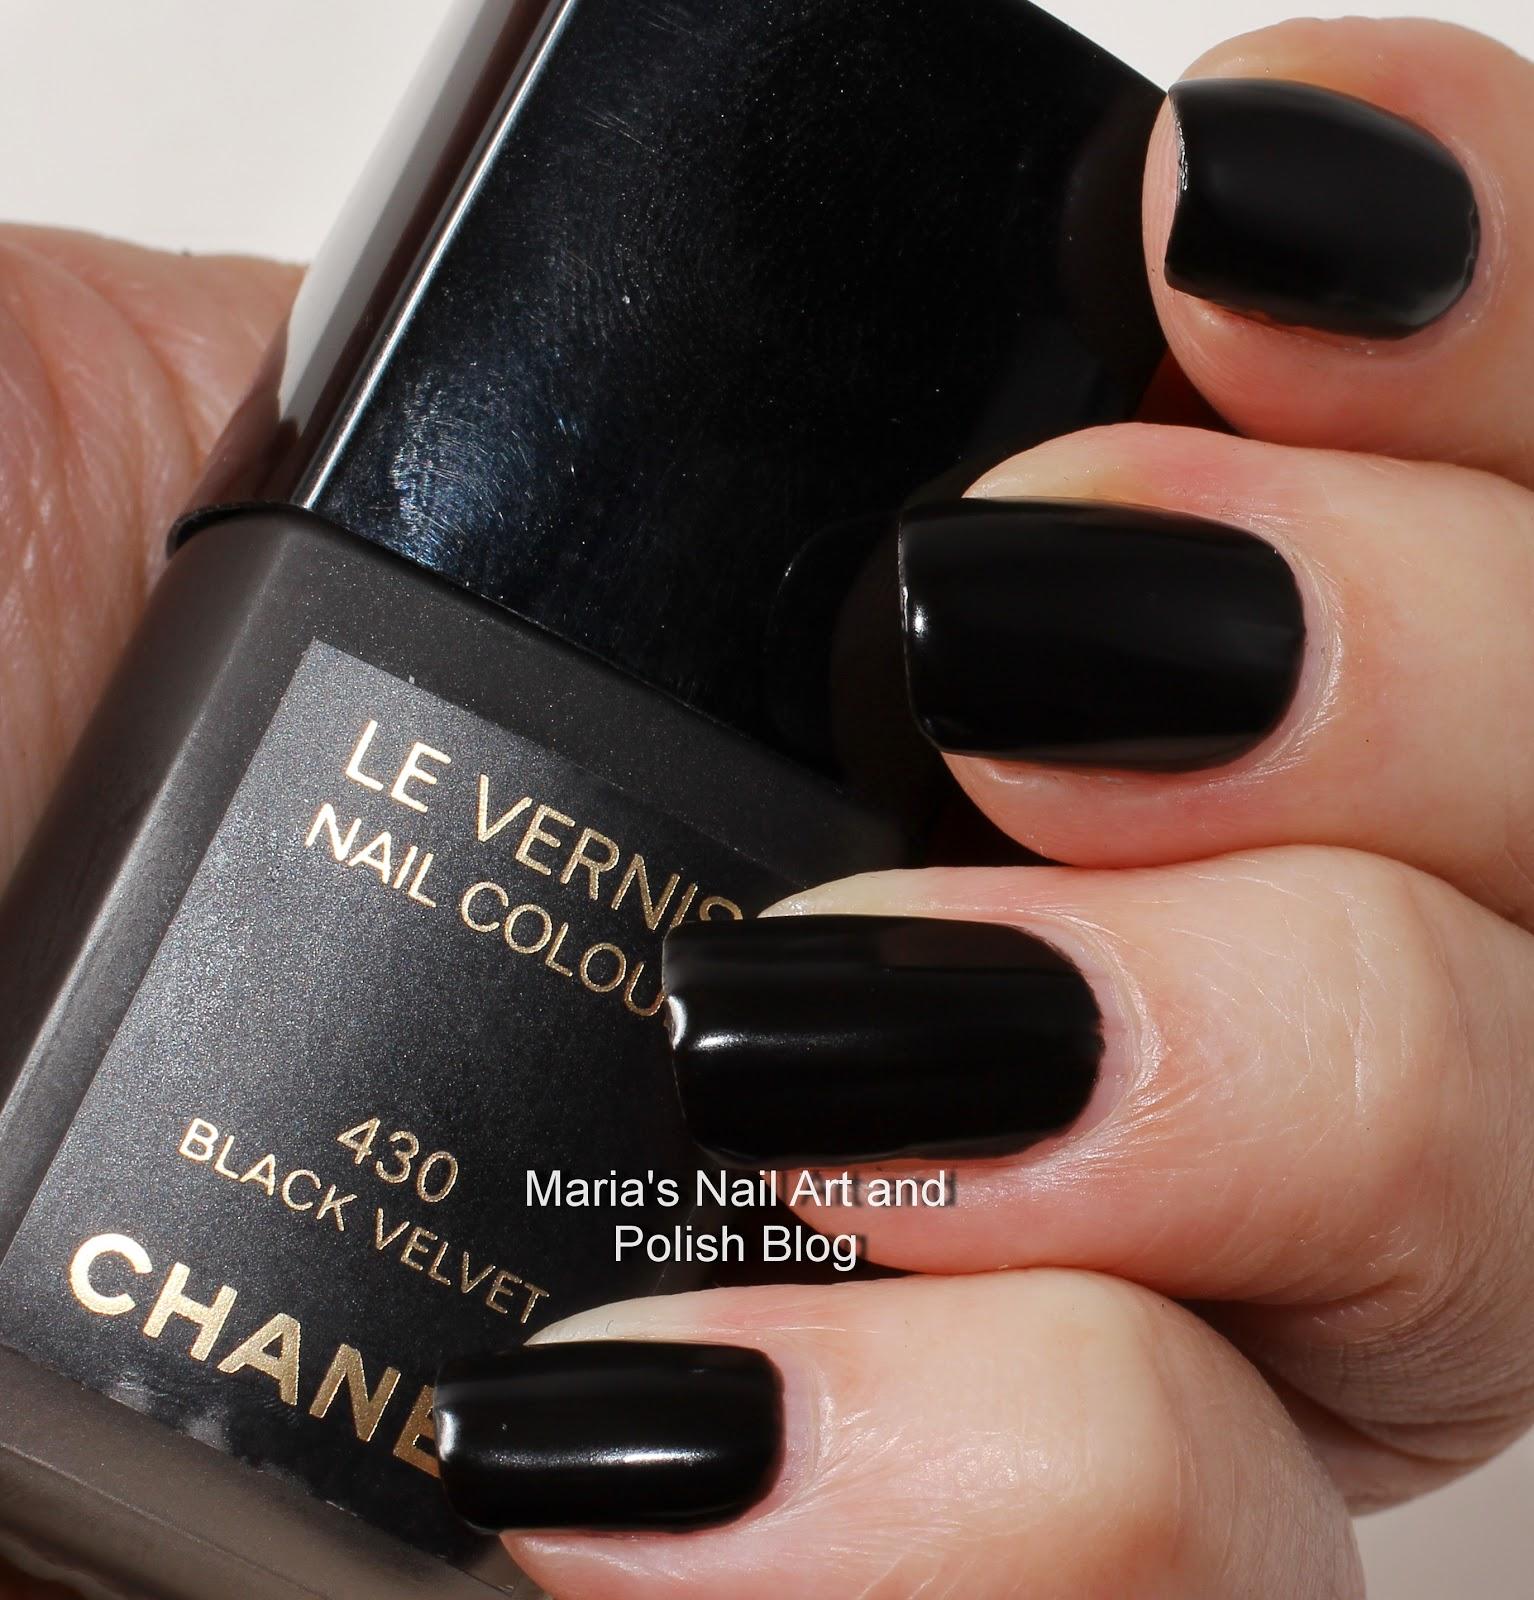 Marias Nail Art And Polish Blog: Chanel Black Velvet 430